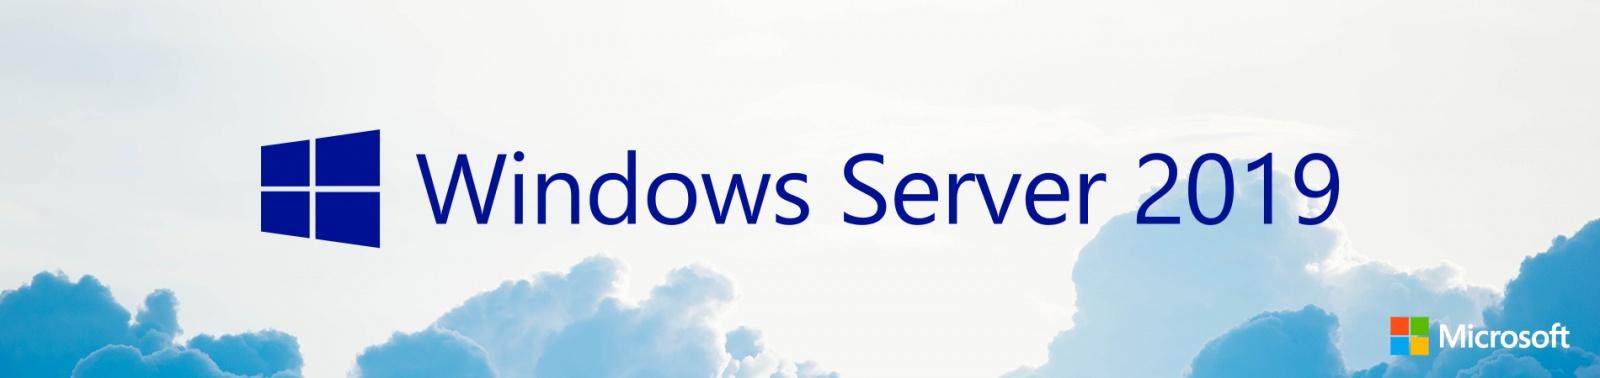 Windows Server 2019 - 1